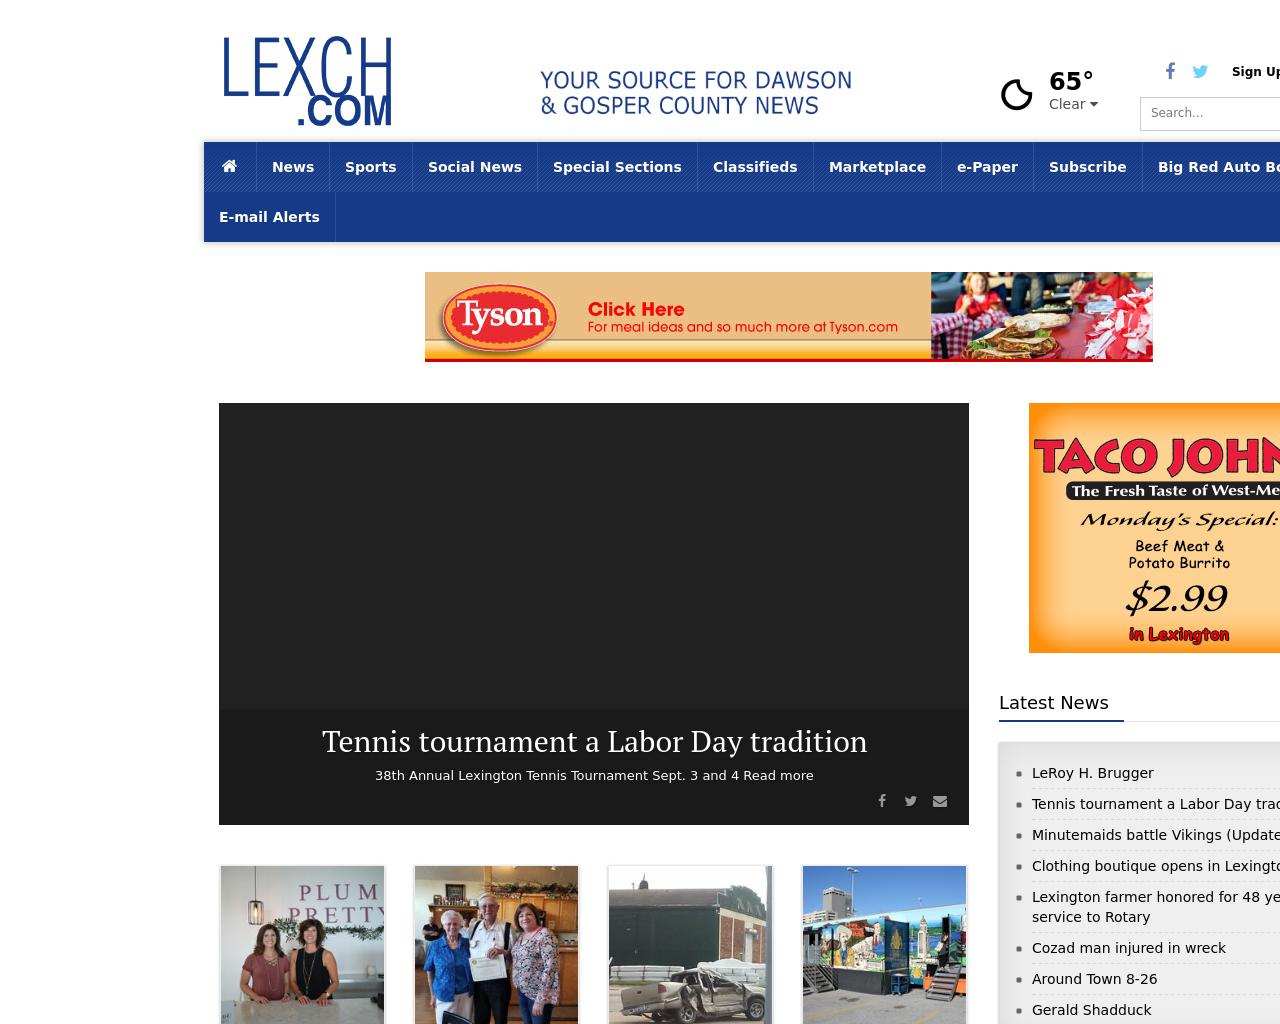 LEXCH.com-Advertising-Reviews-Pricing